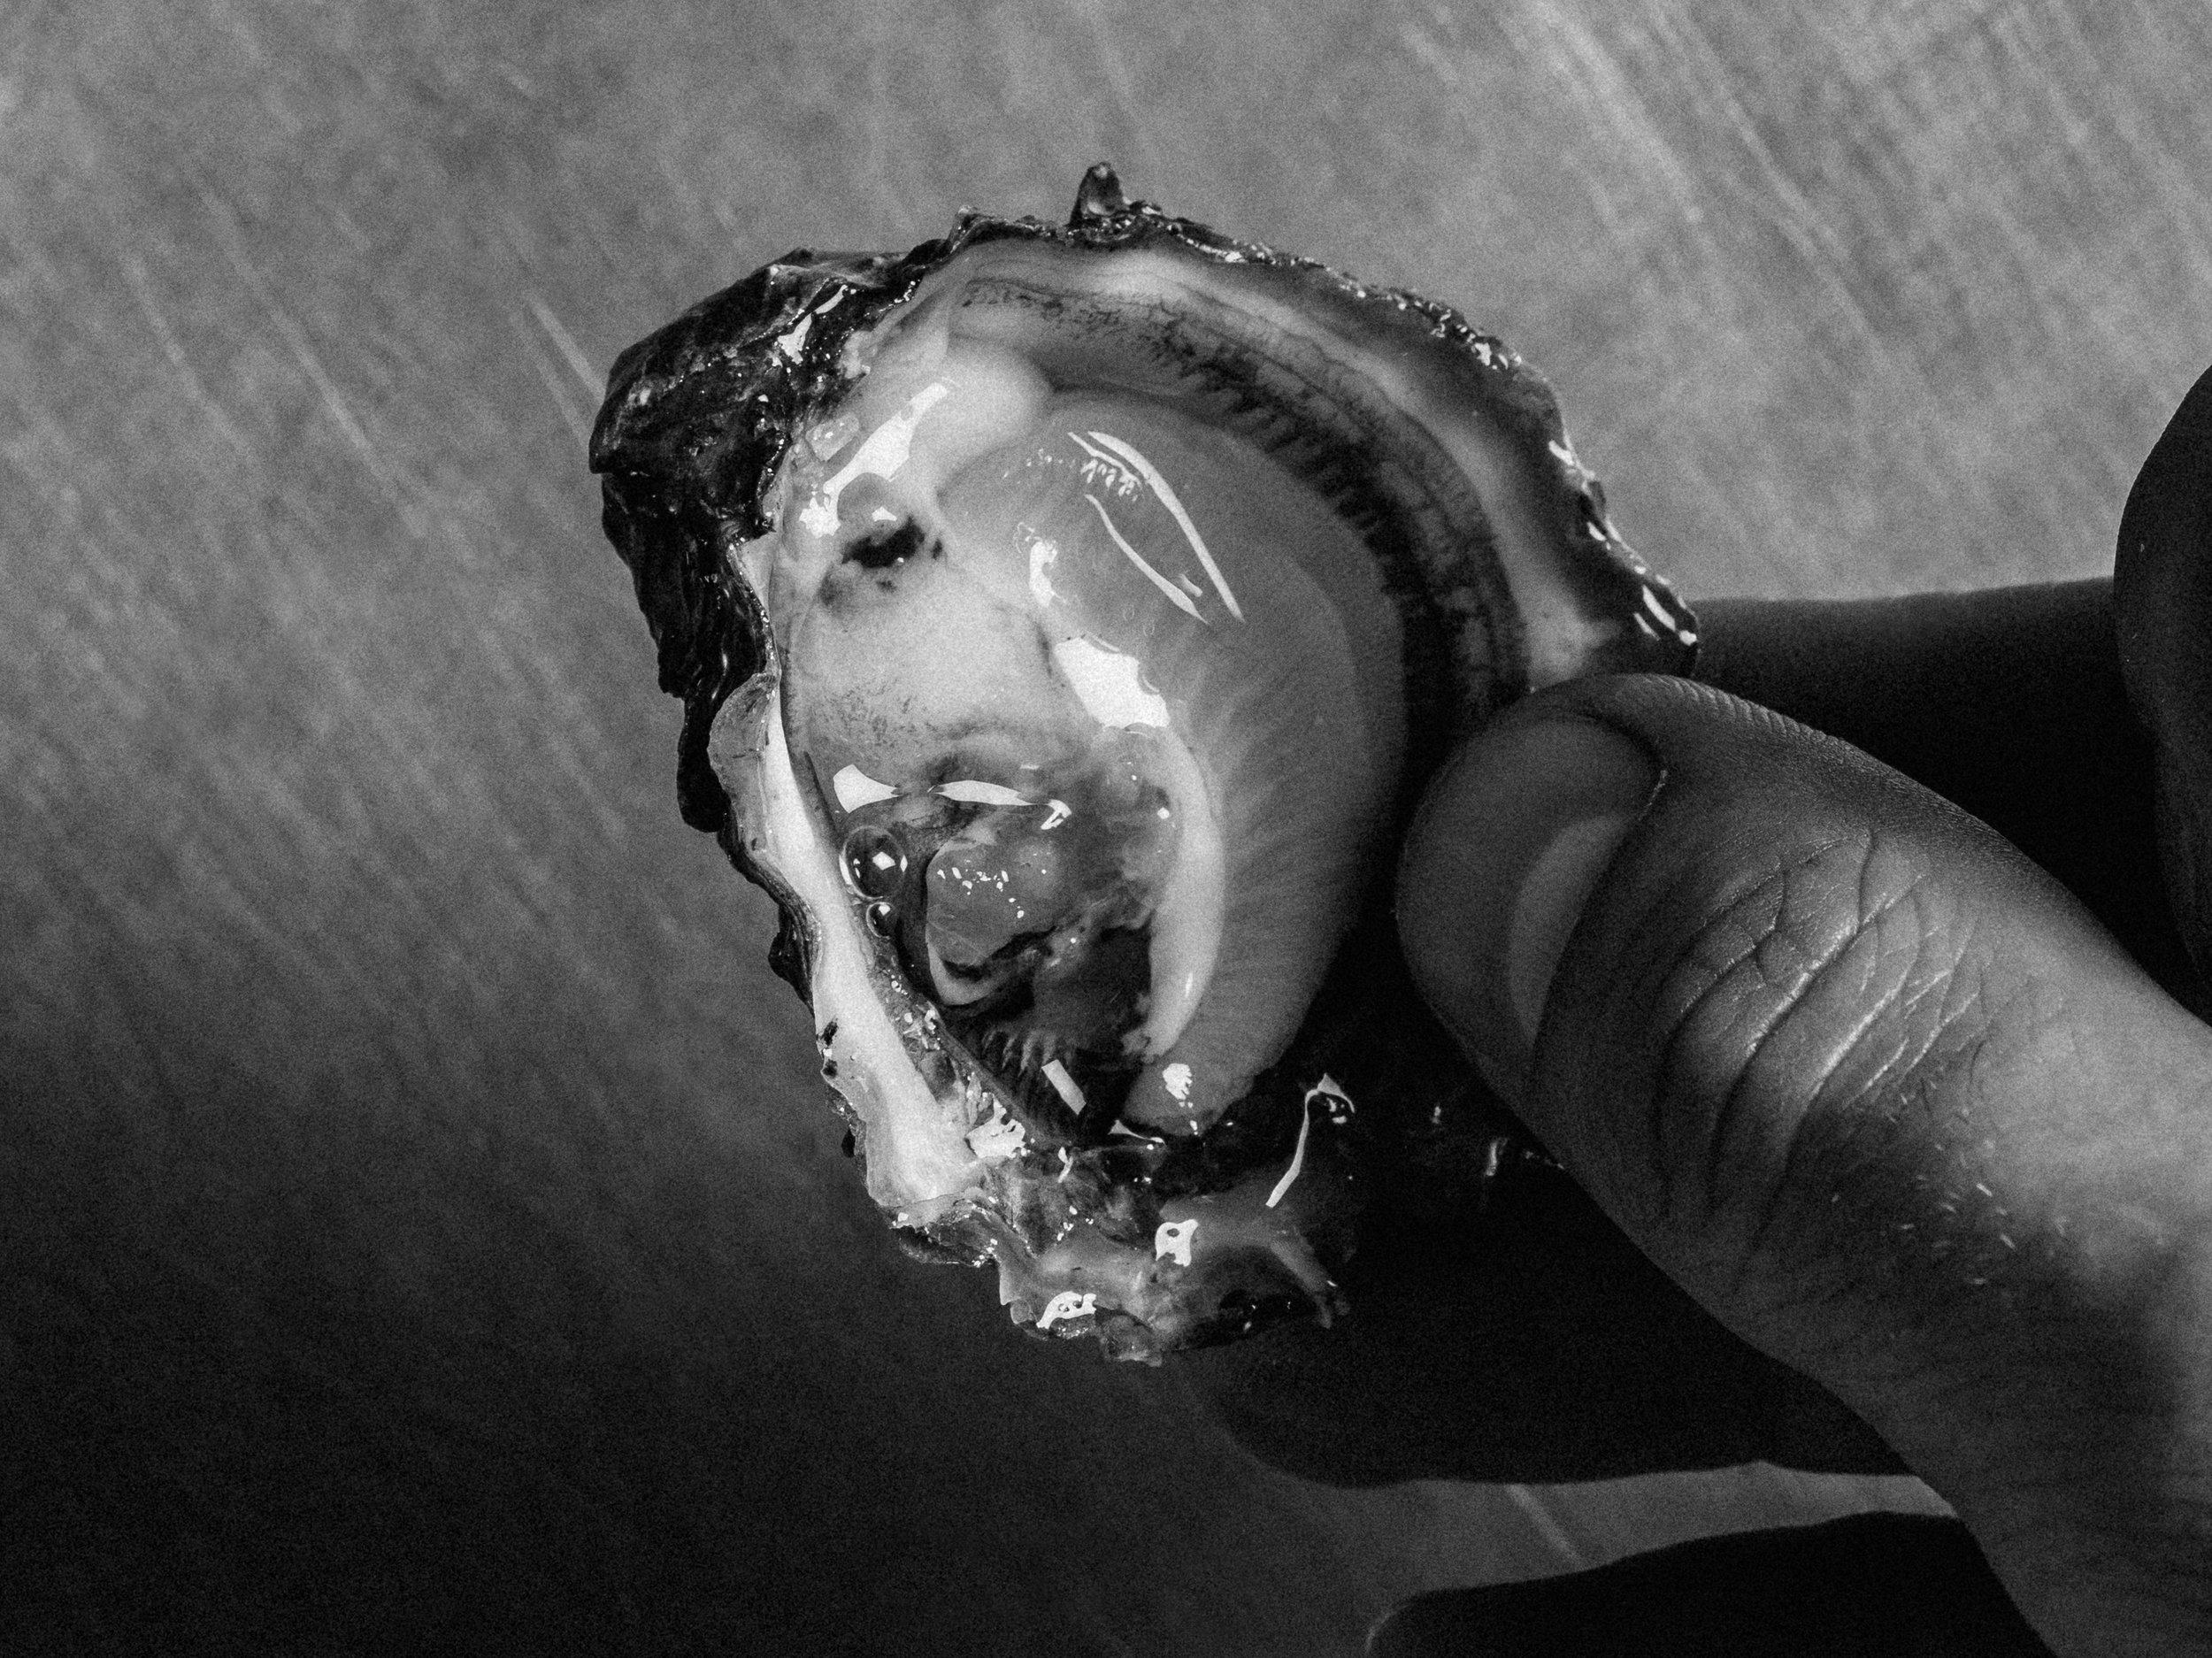 Fingers holding a shellfish.